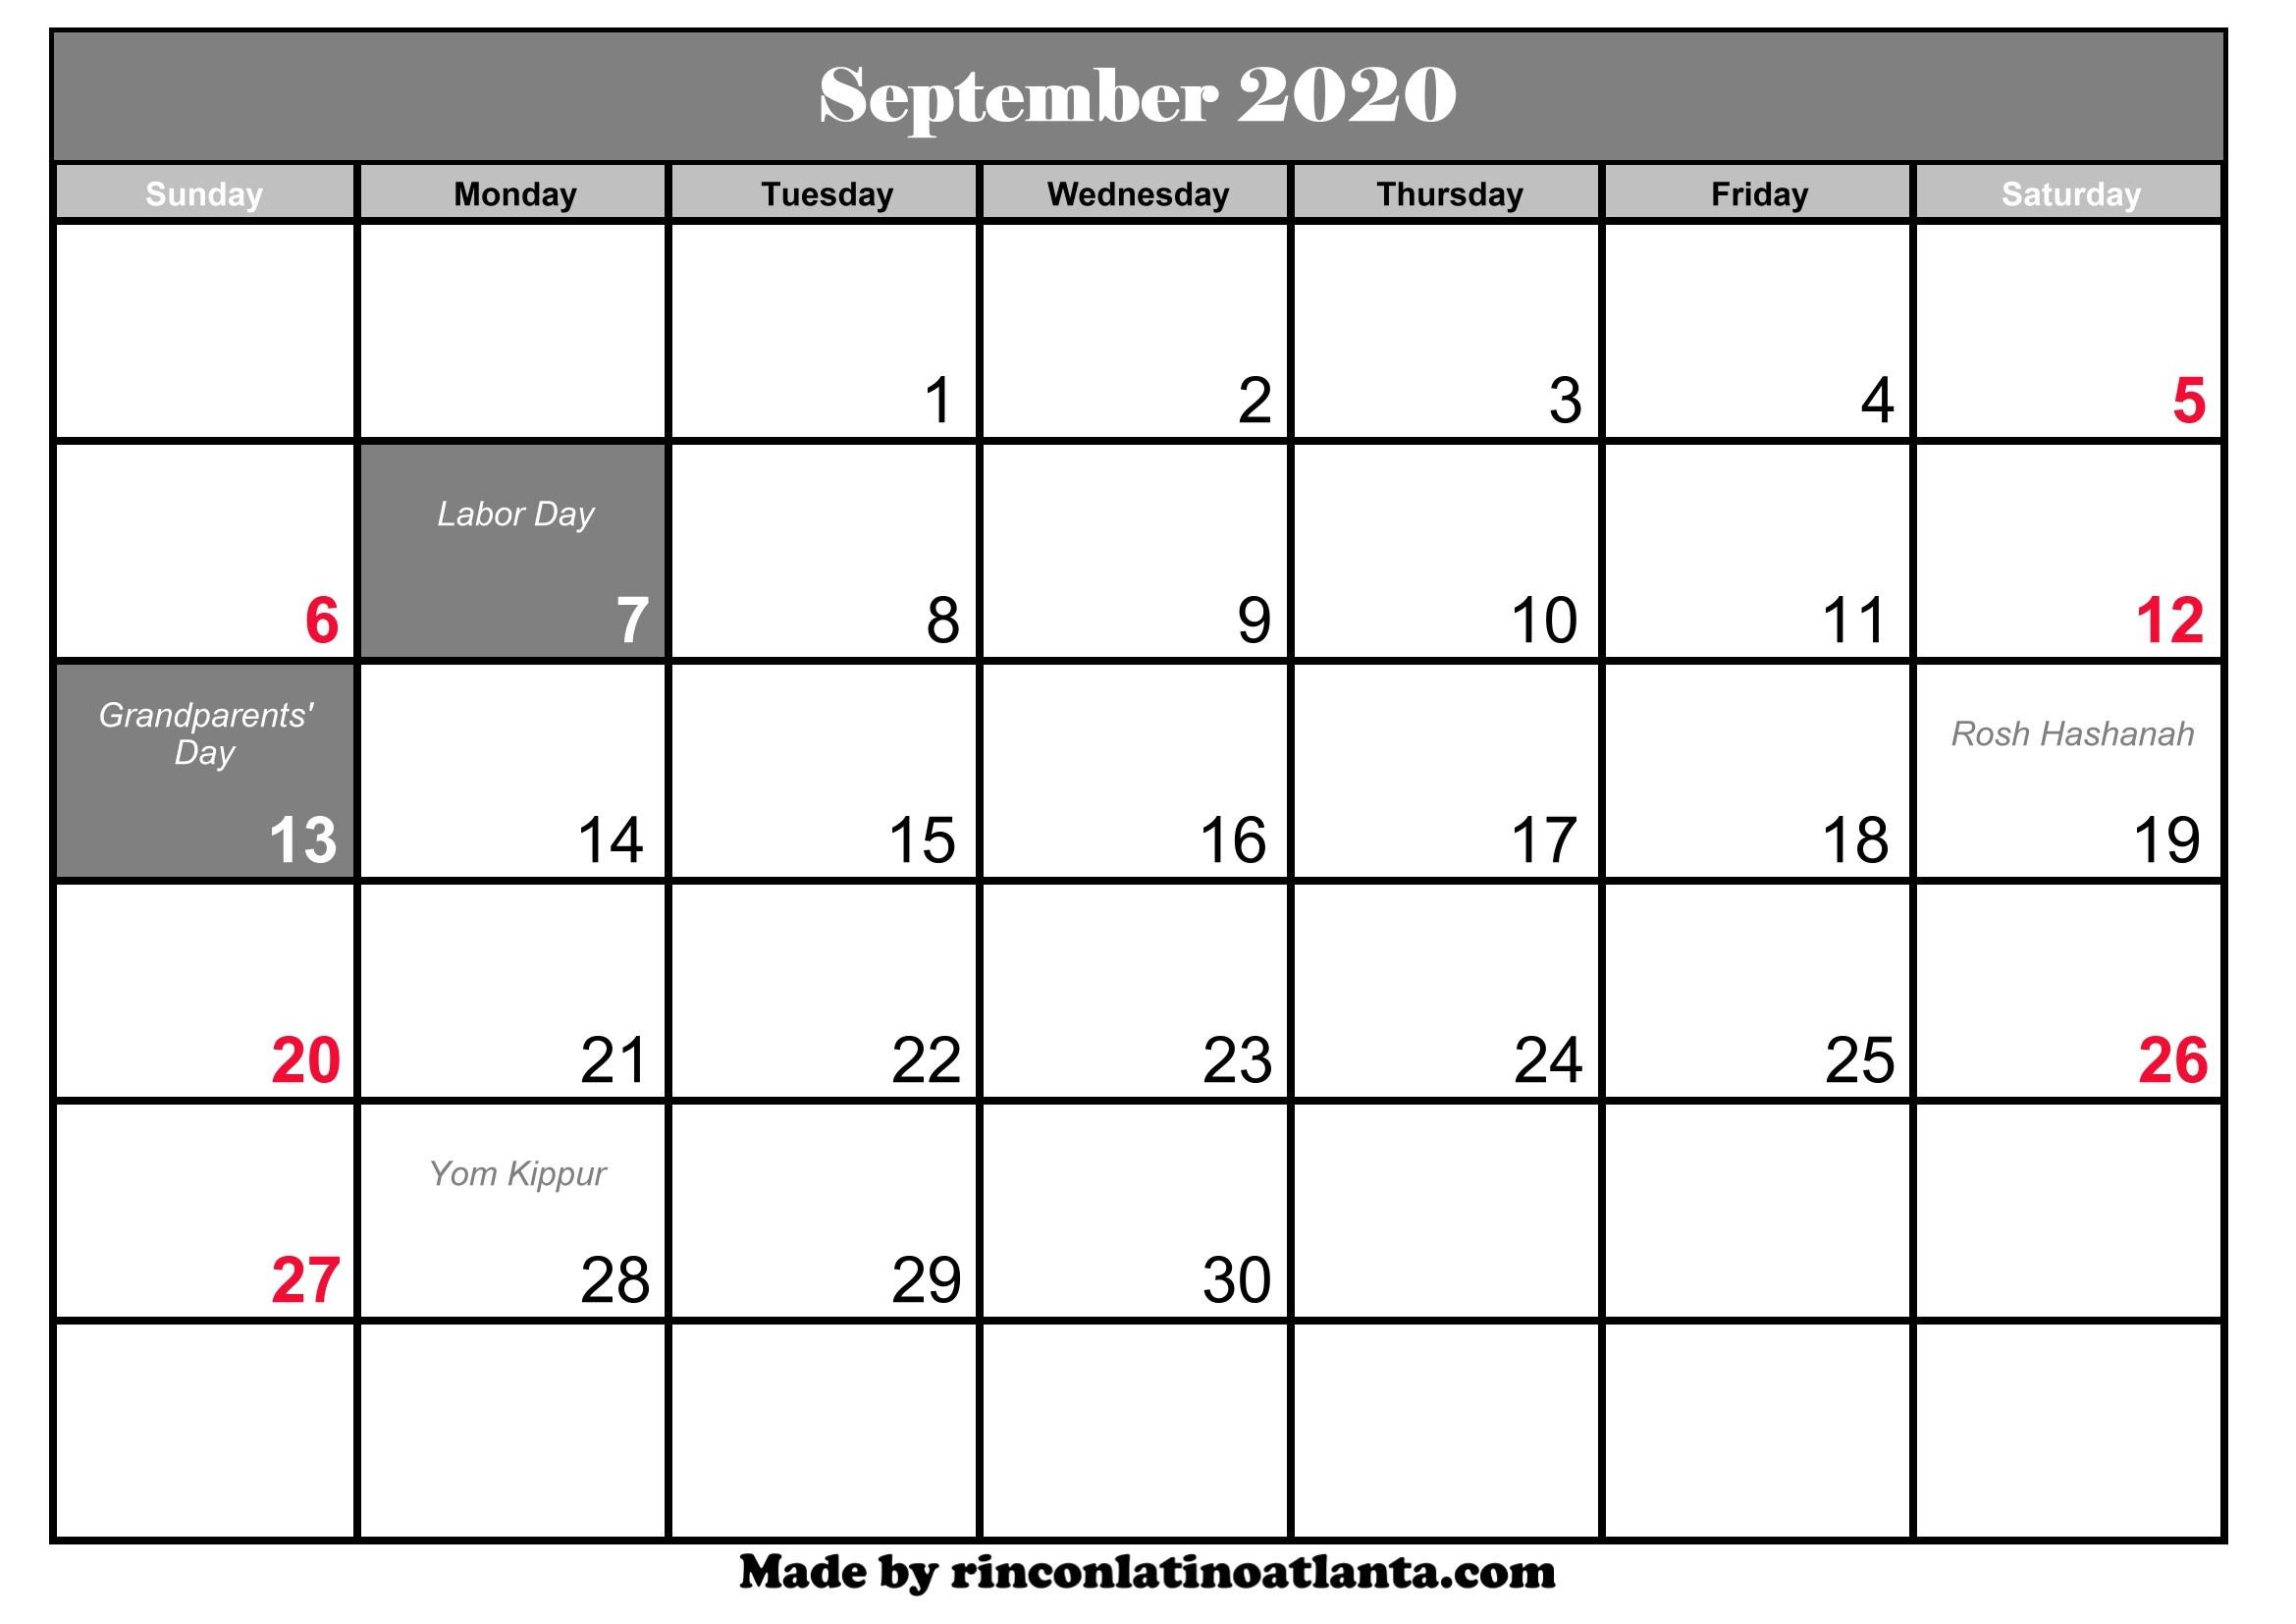 September 2020 Calendar Printable September 2020 Calendar with Holidays